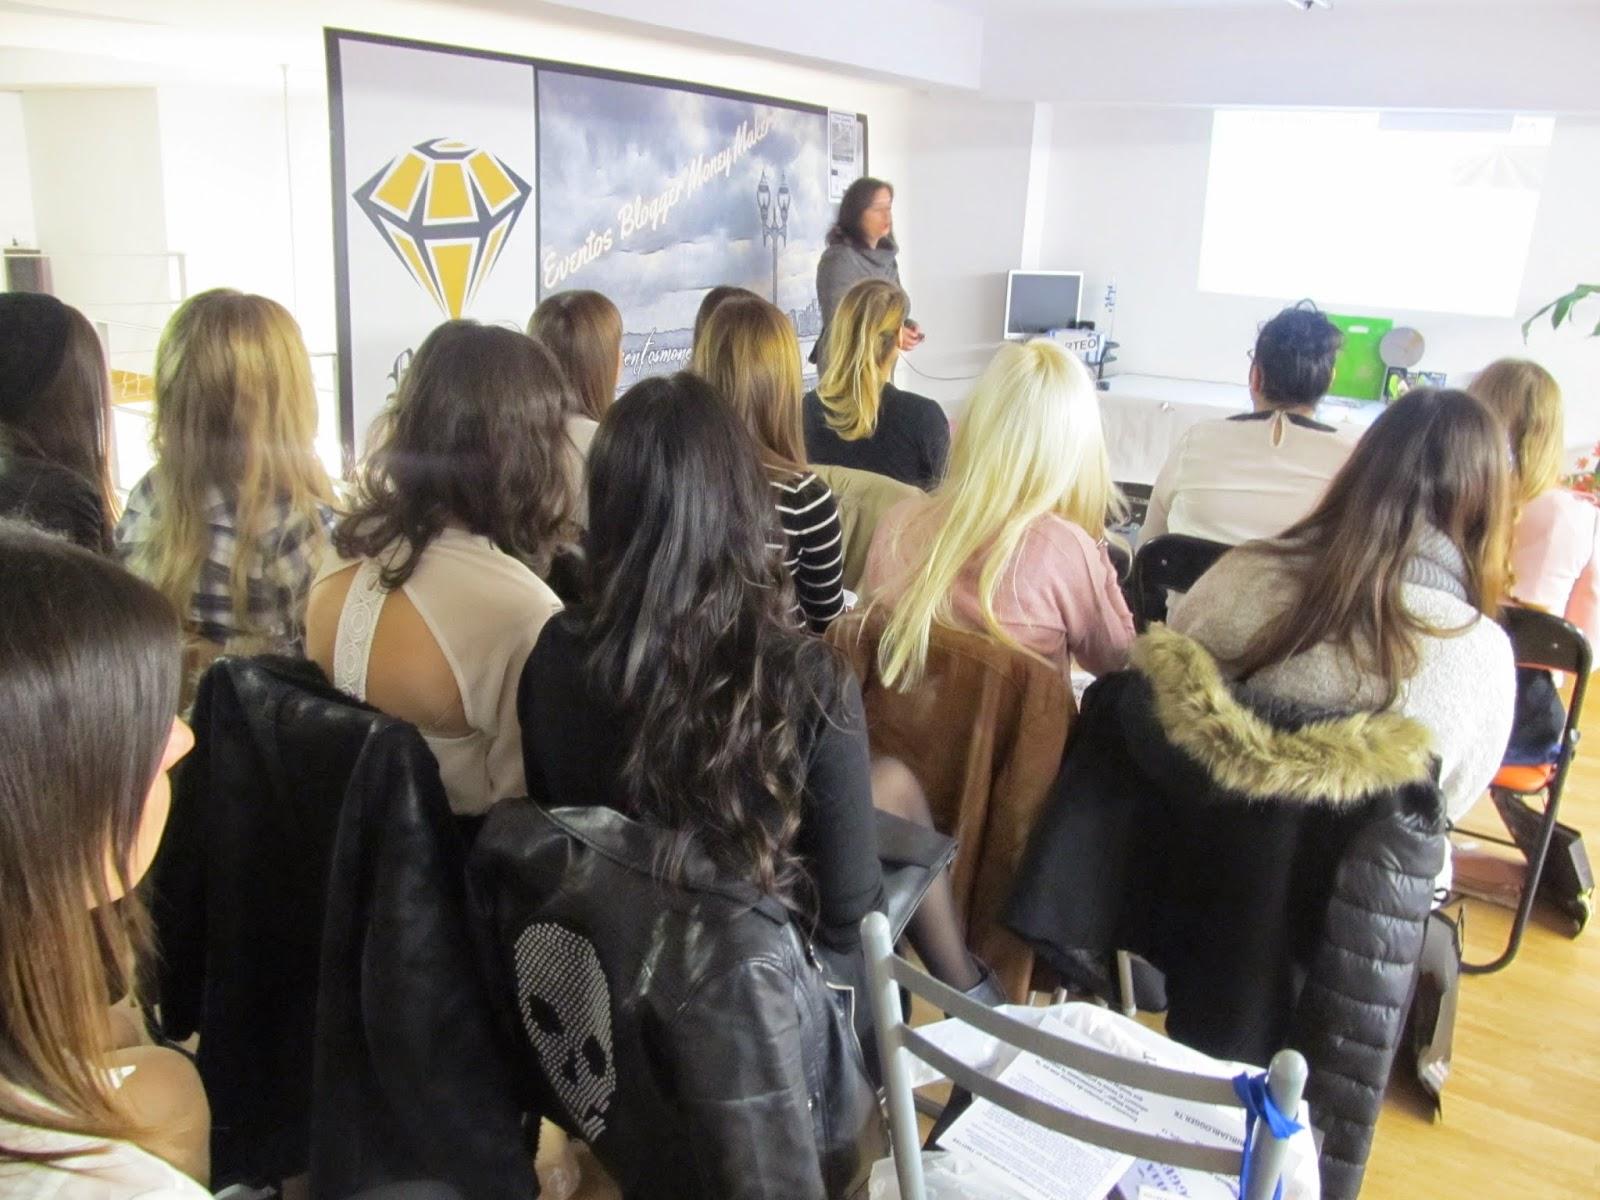 herbalife nutribelleza evento blogger encuentro beauty villa de gijon